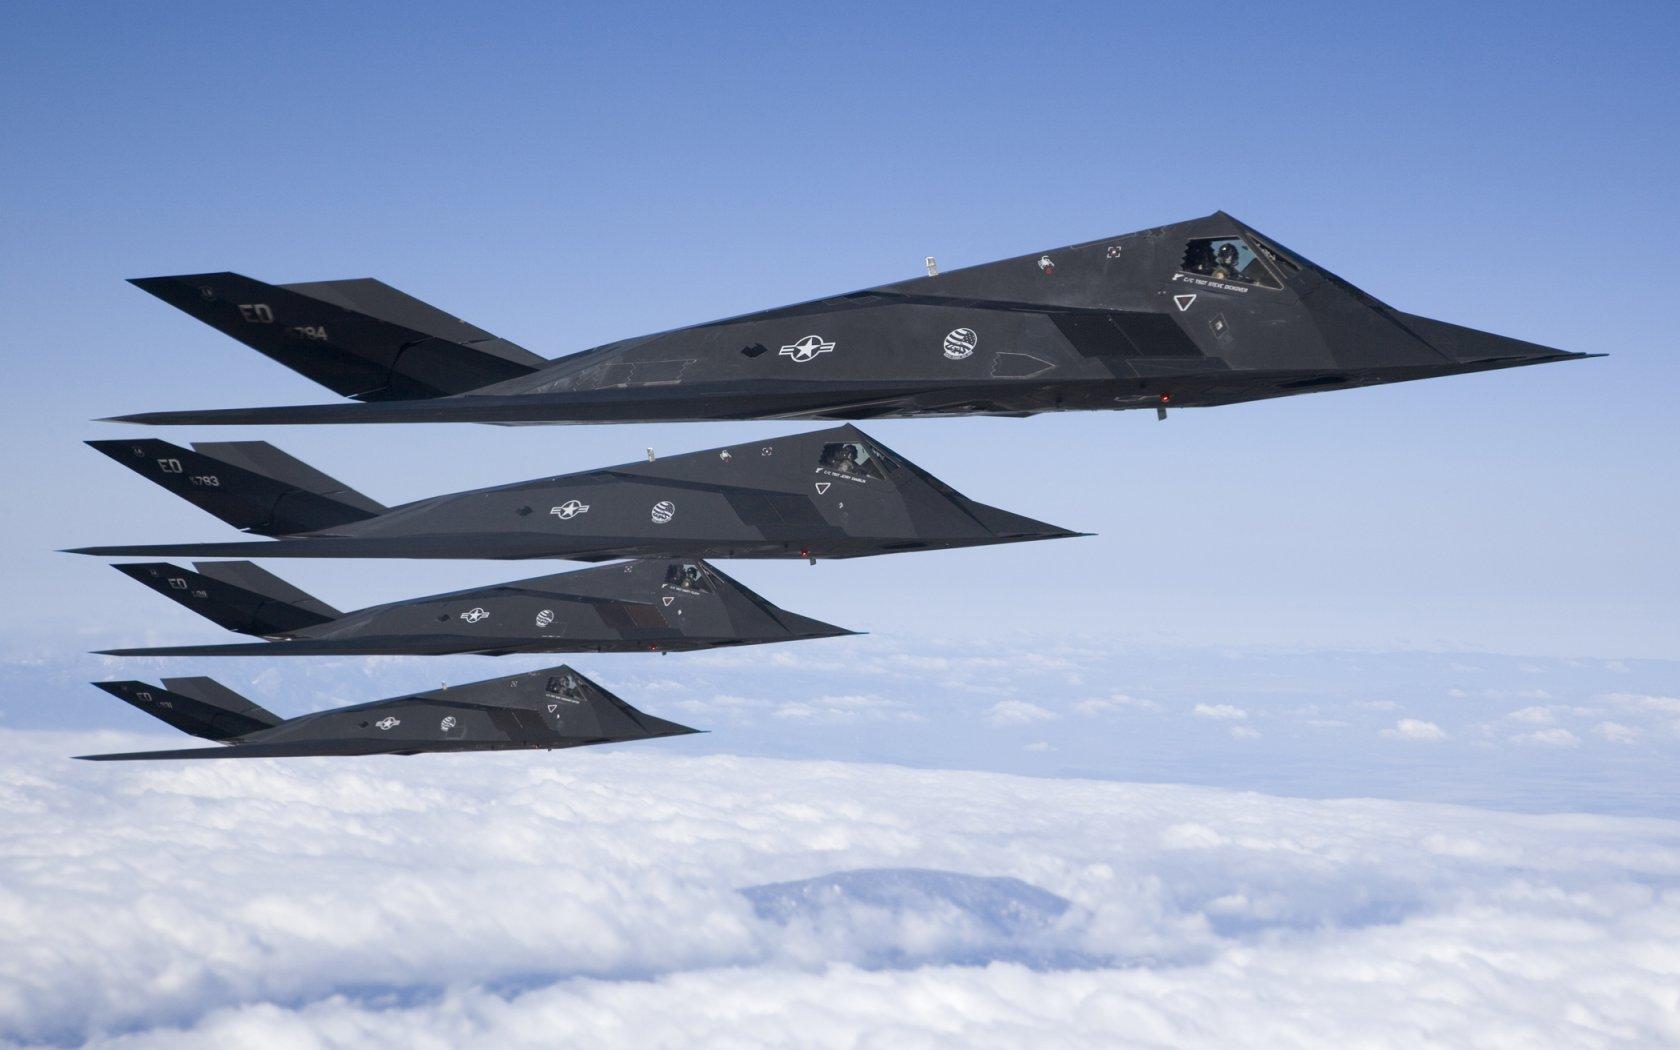 Lockheed F-117 - 1680x1050